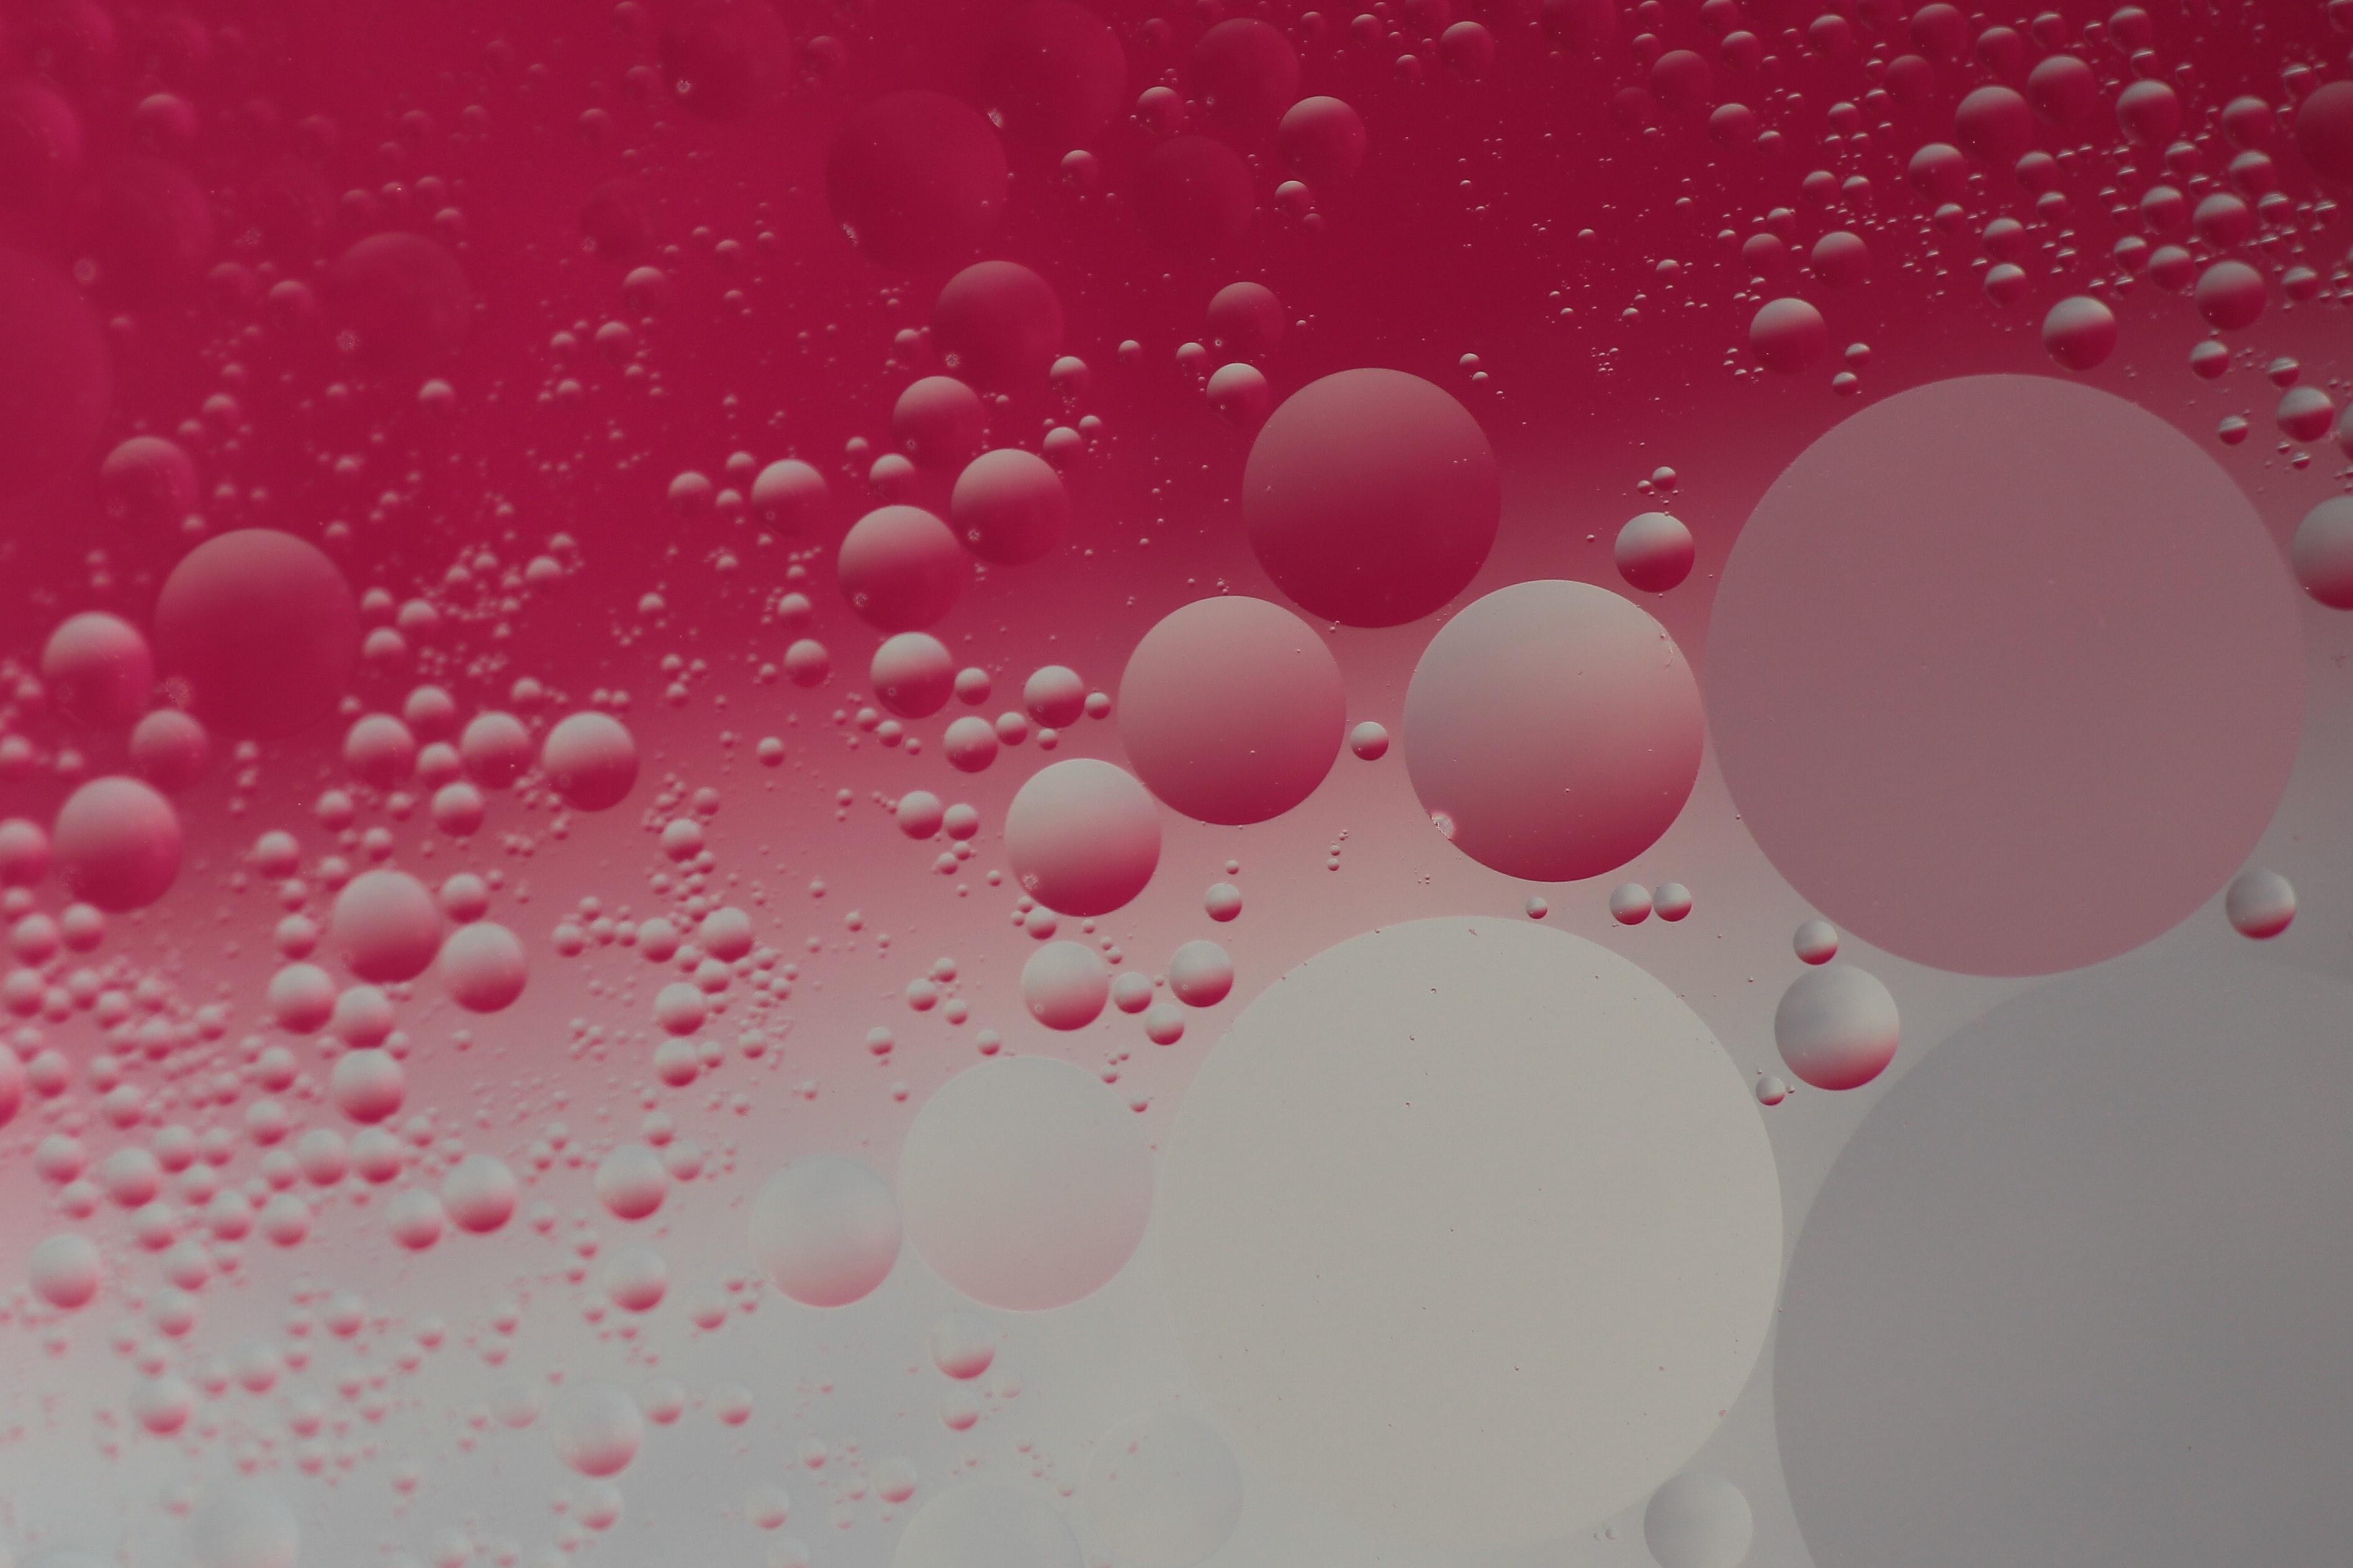 Plaatje 3 blog programmamanger en ontwerper - roze